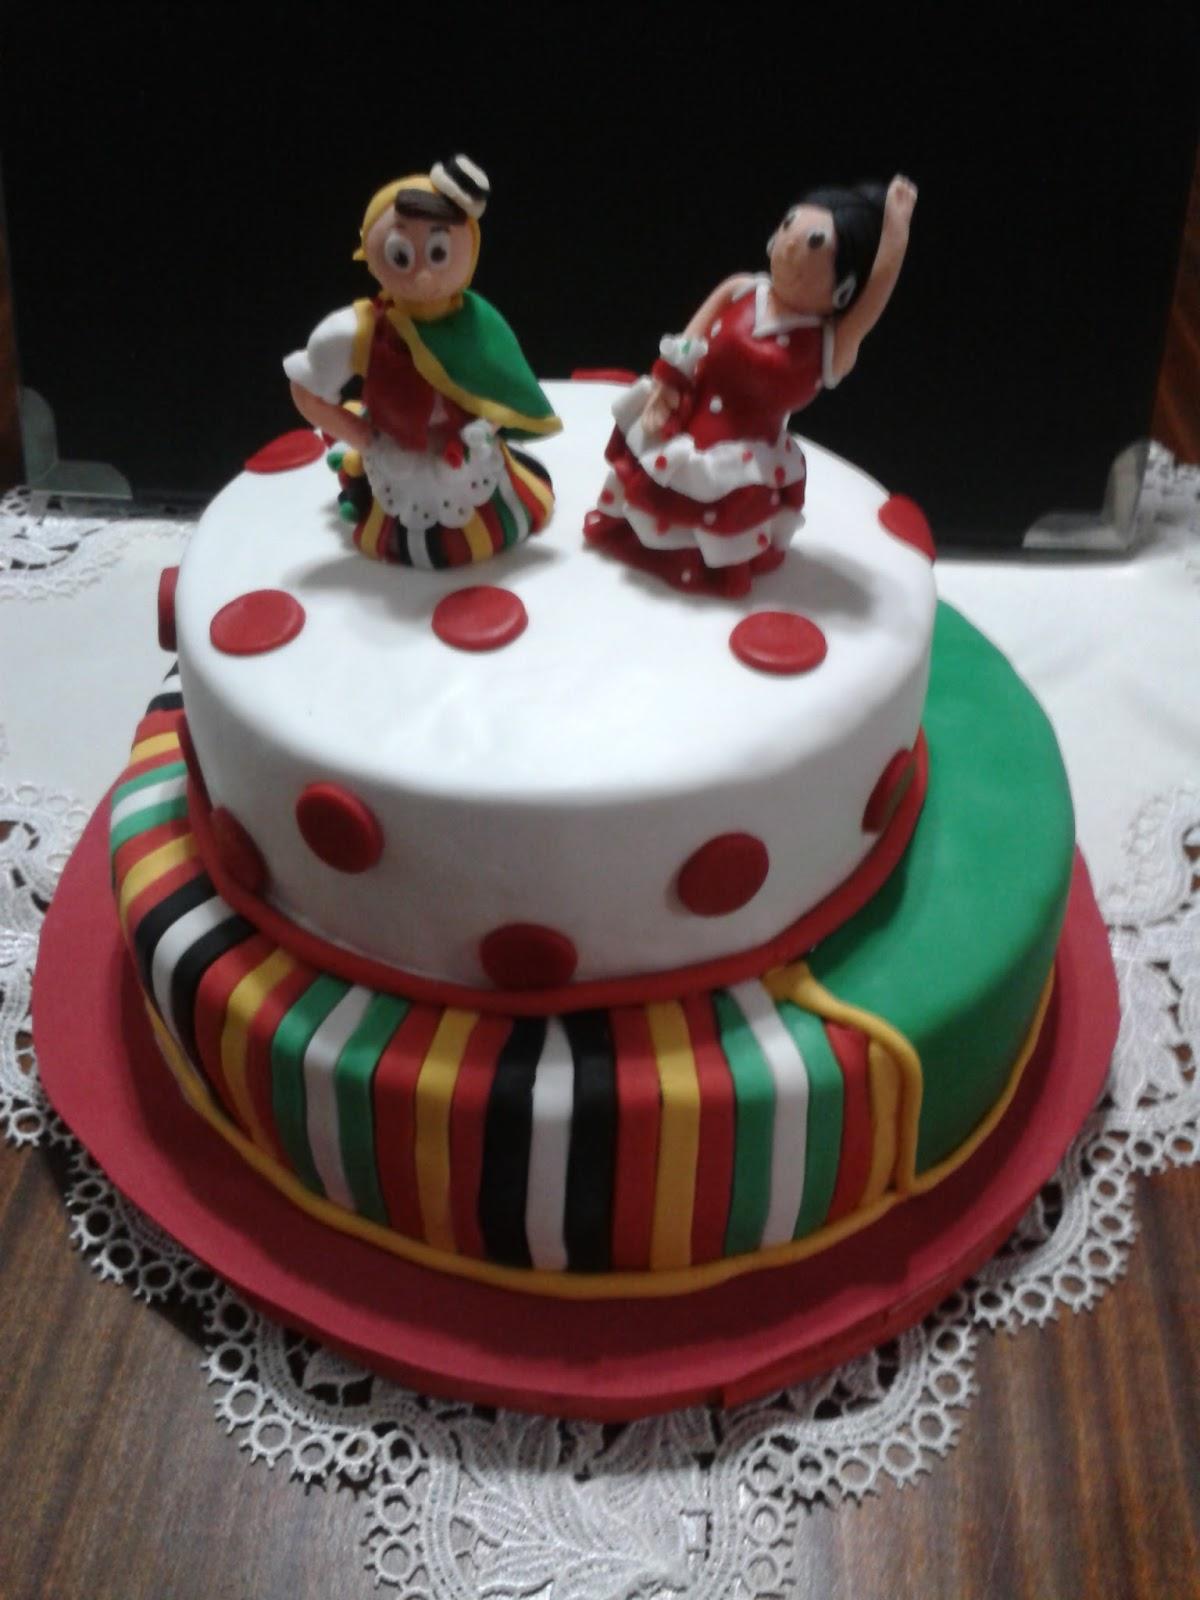 Cupcakes tenerife una tarta de boda original - Cupcakes tenerife ...